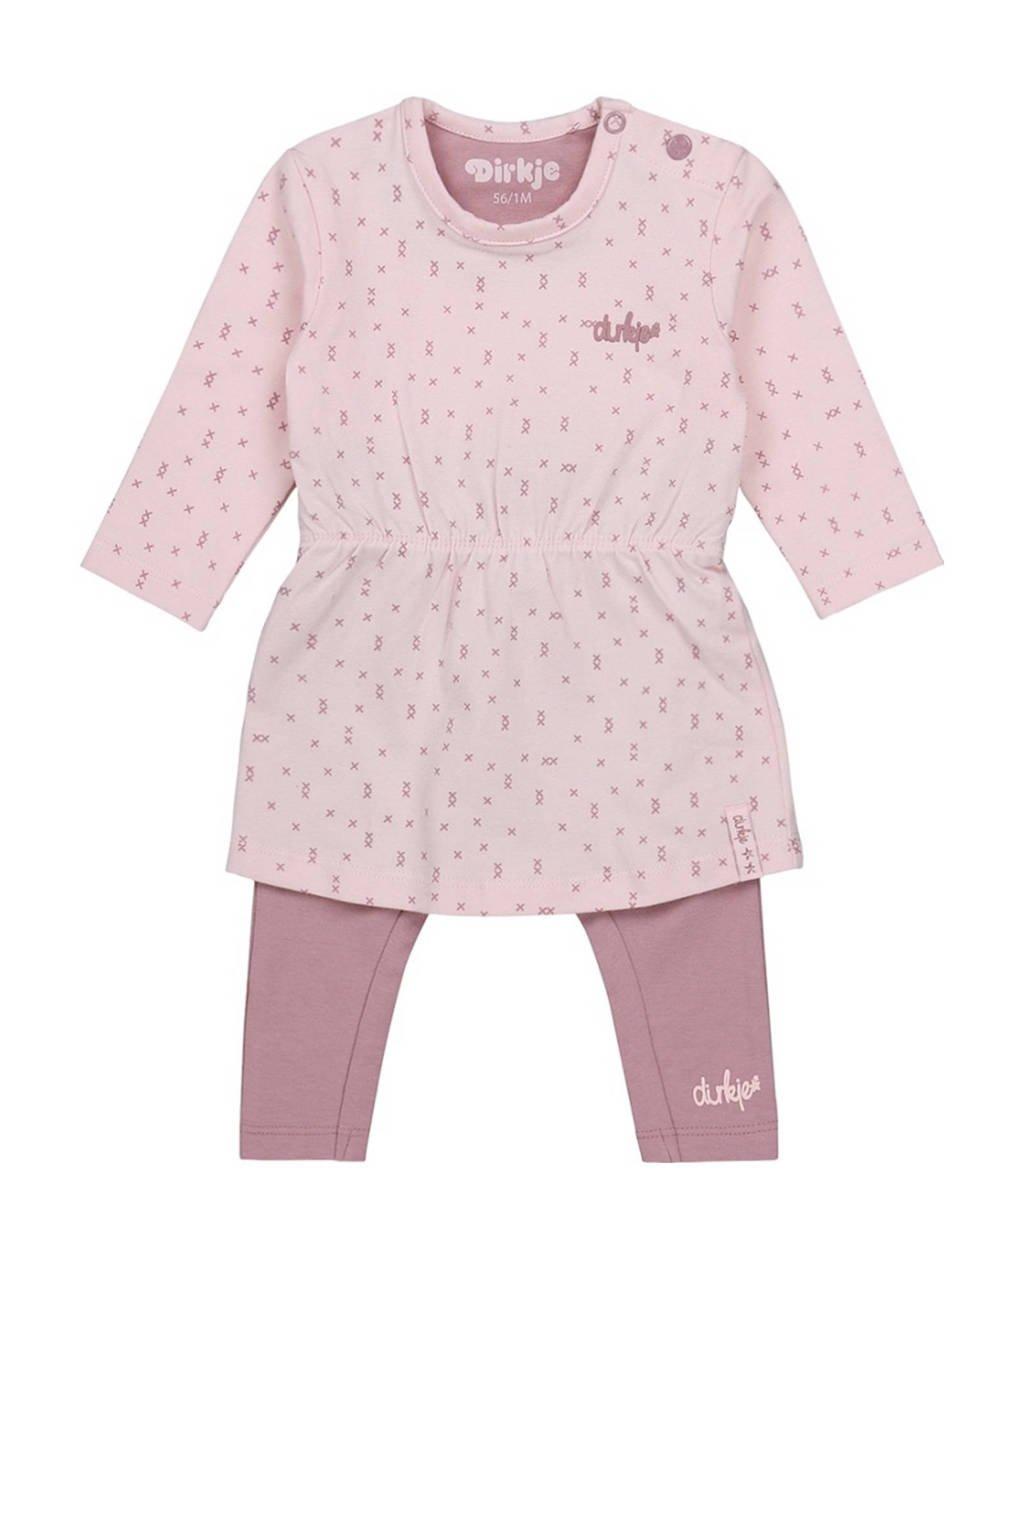 Dirkje baby jurk + legging met biologisch katoen roze/lichtroze, Roze/lichtroze